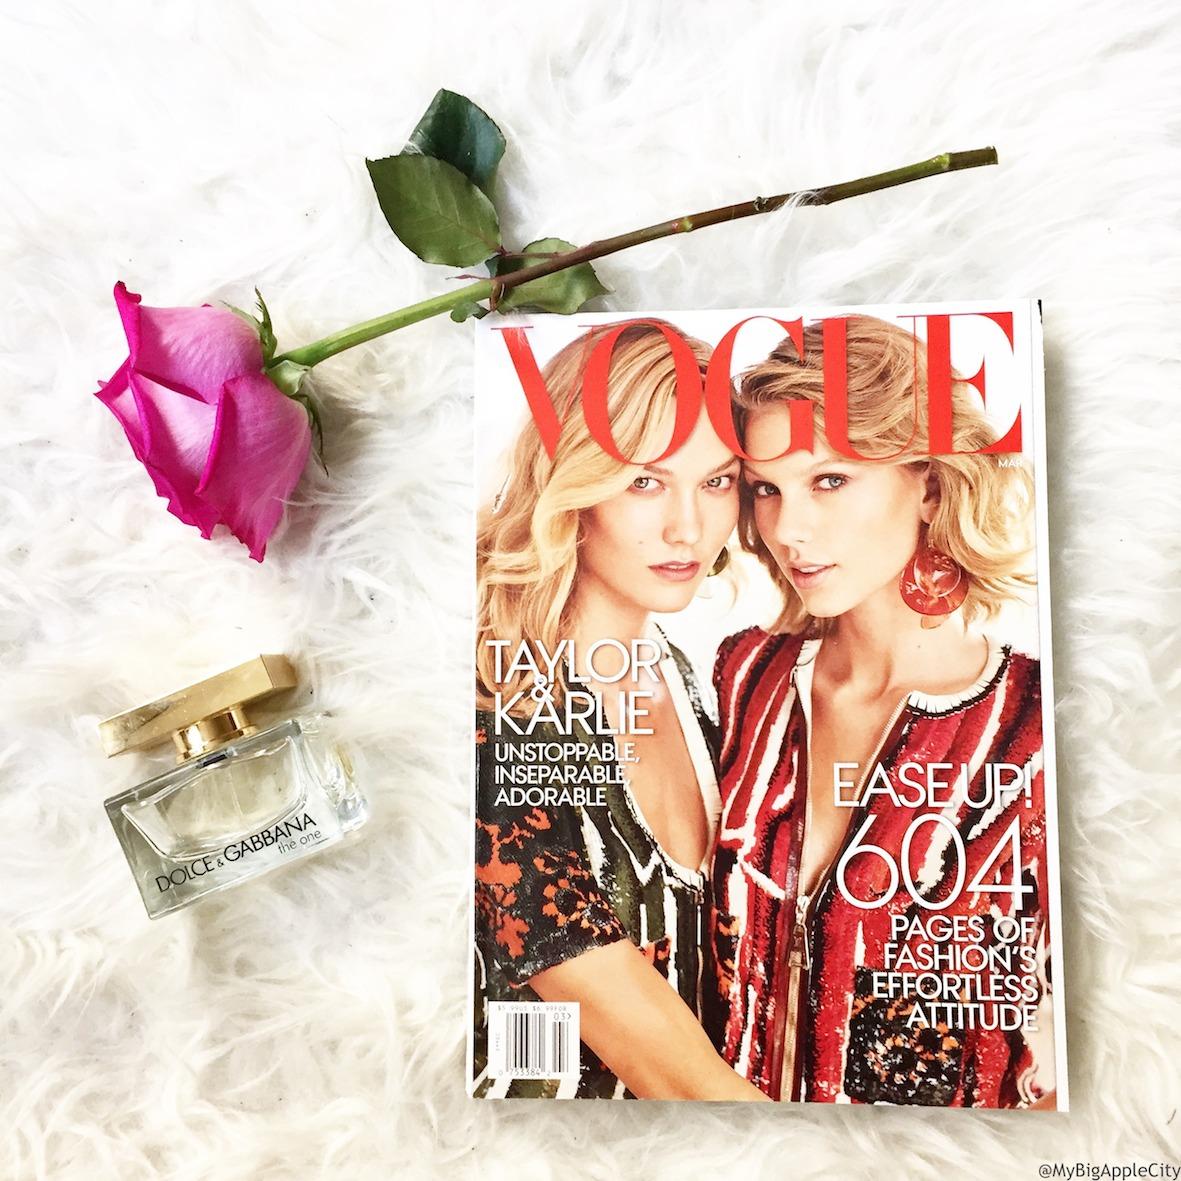 MyBigAppleCity-new-york-fashionblogger-february-2015